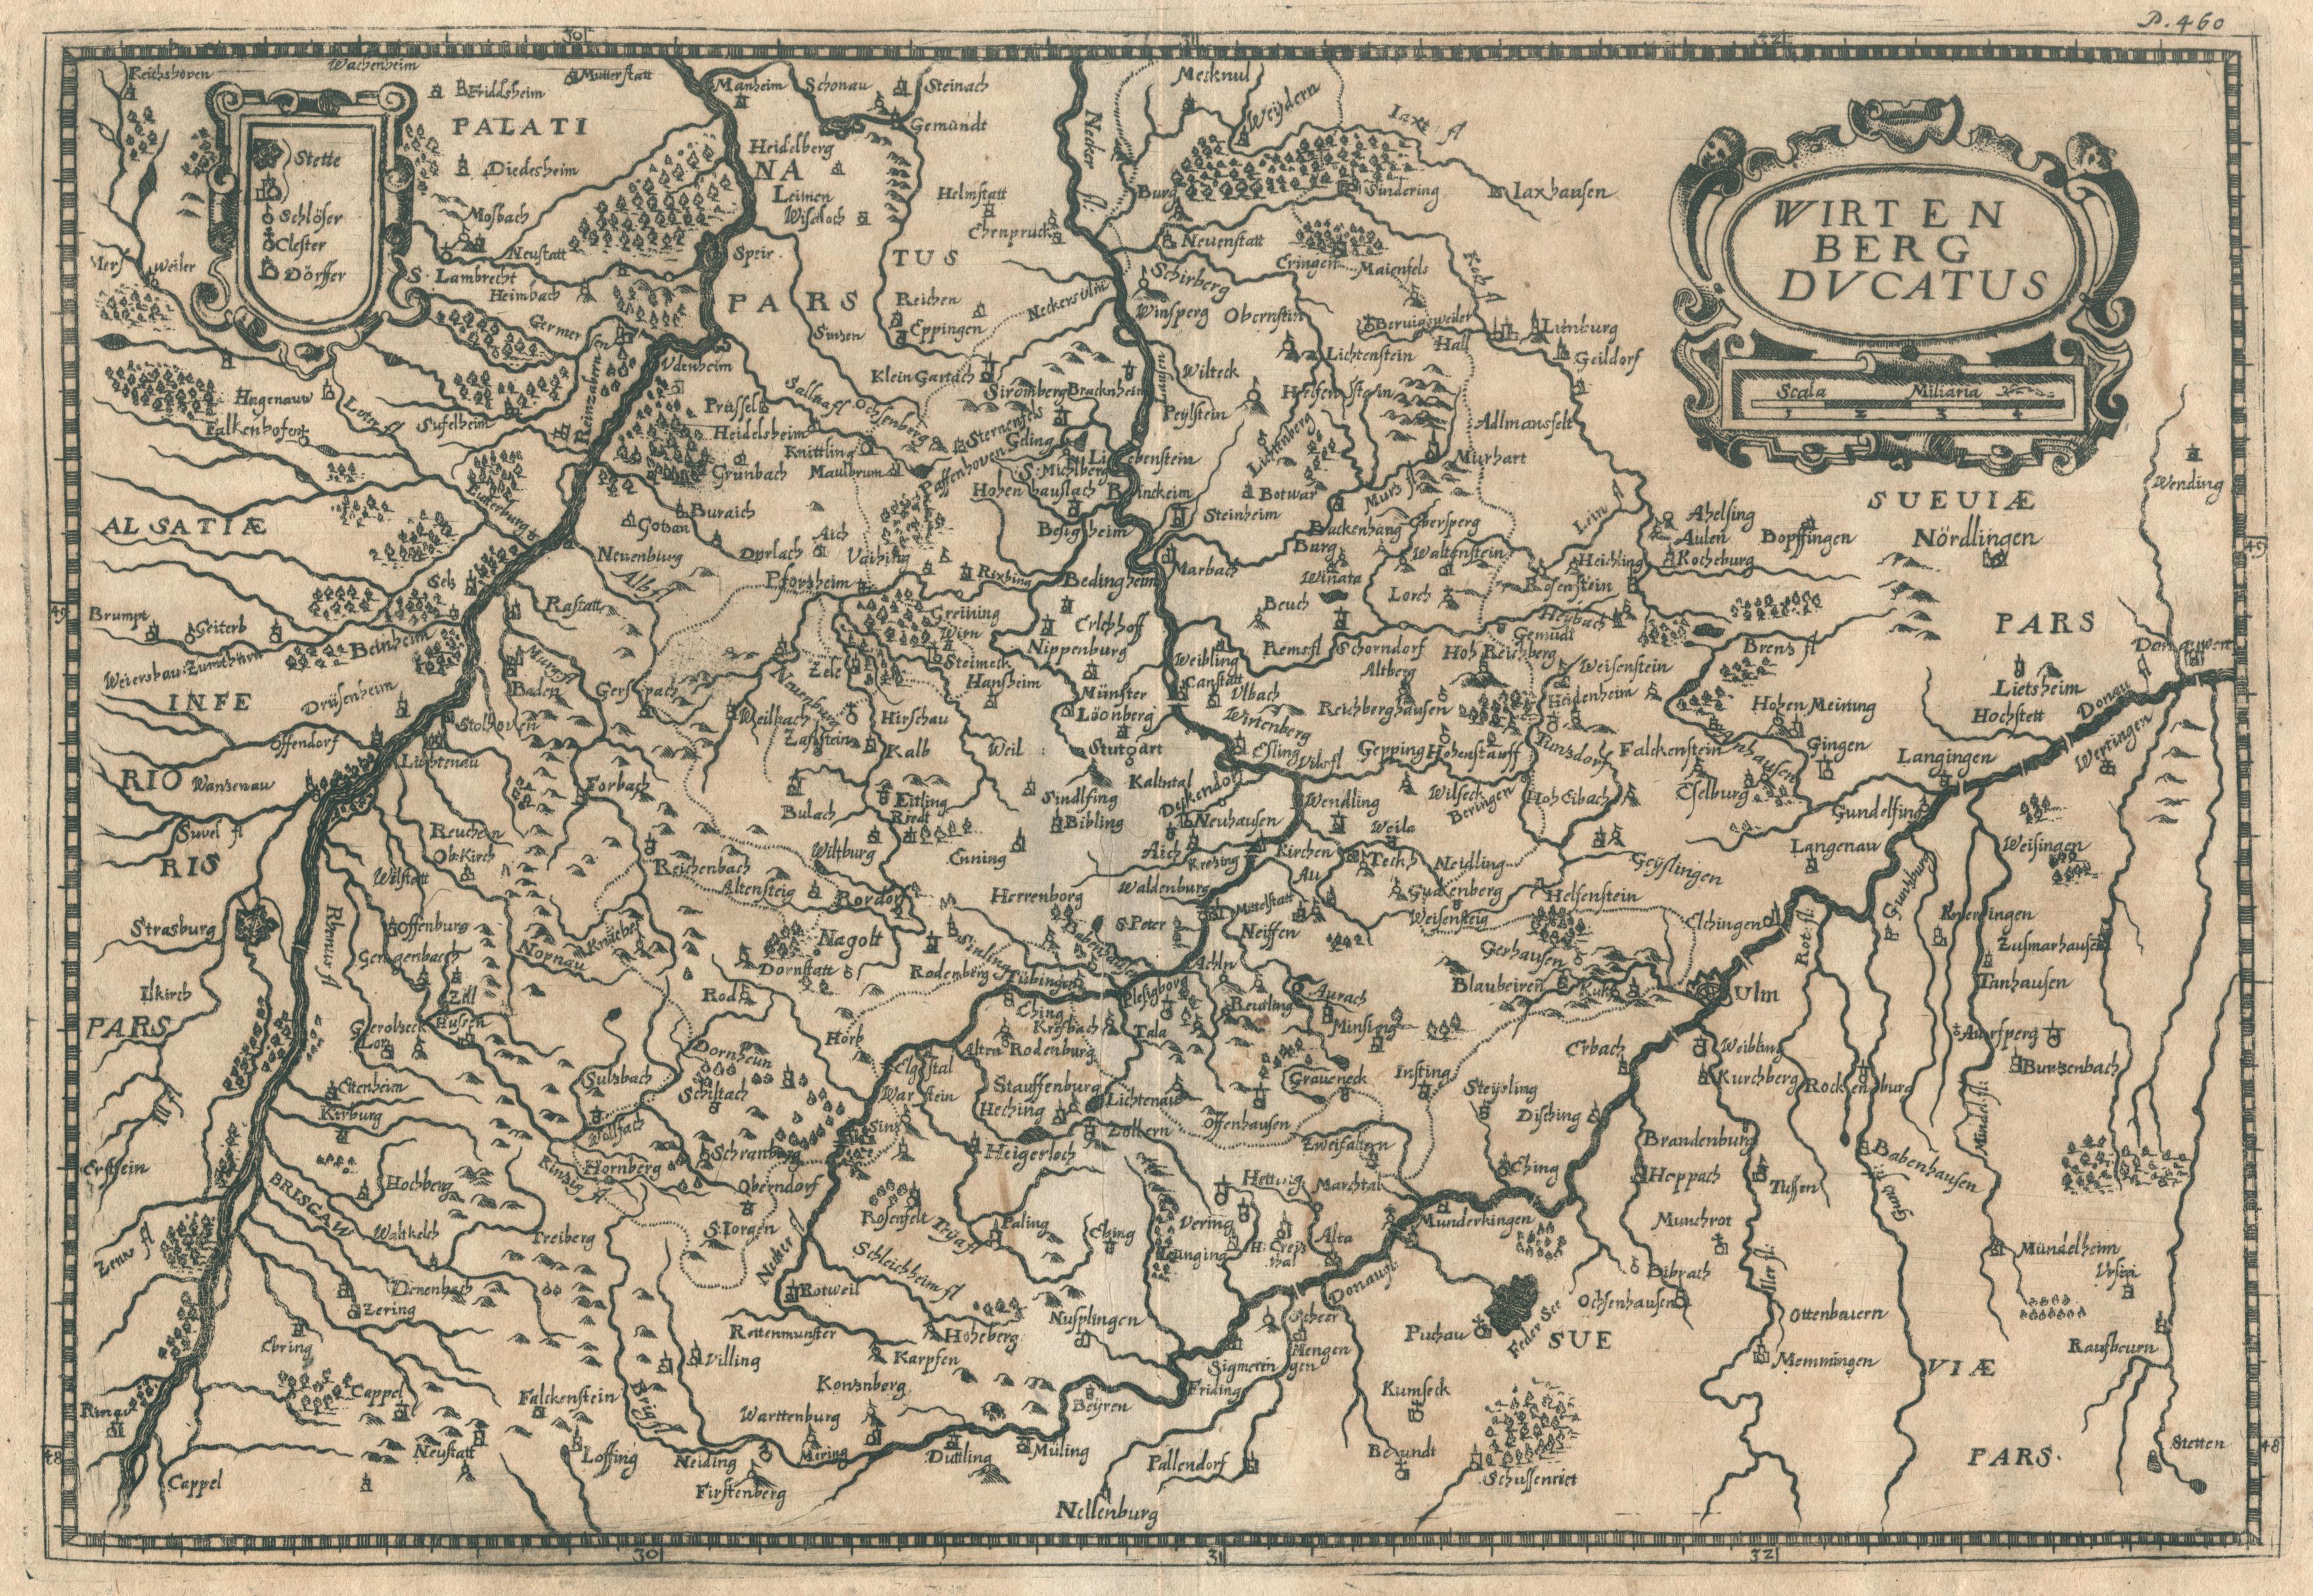 "Kst.- Karte, b. Joh. Hoffmann, ""Wirtenberg dvcatus"".: Württemberg ( Herzogtum"